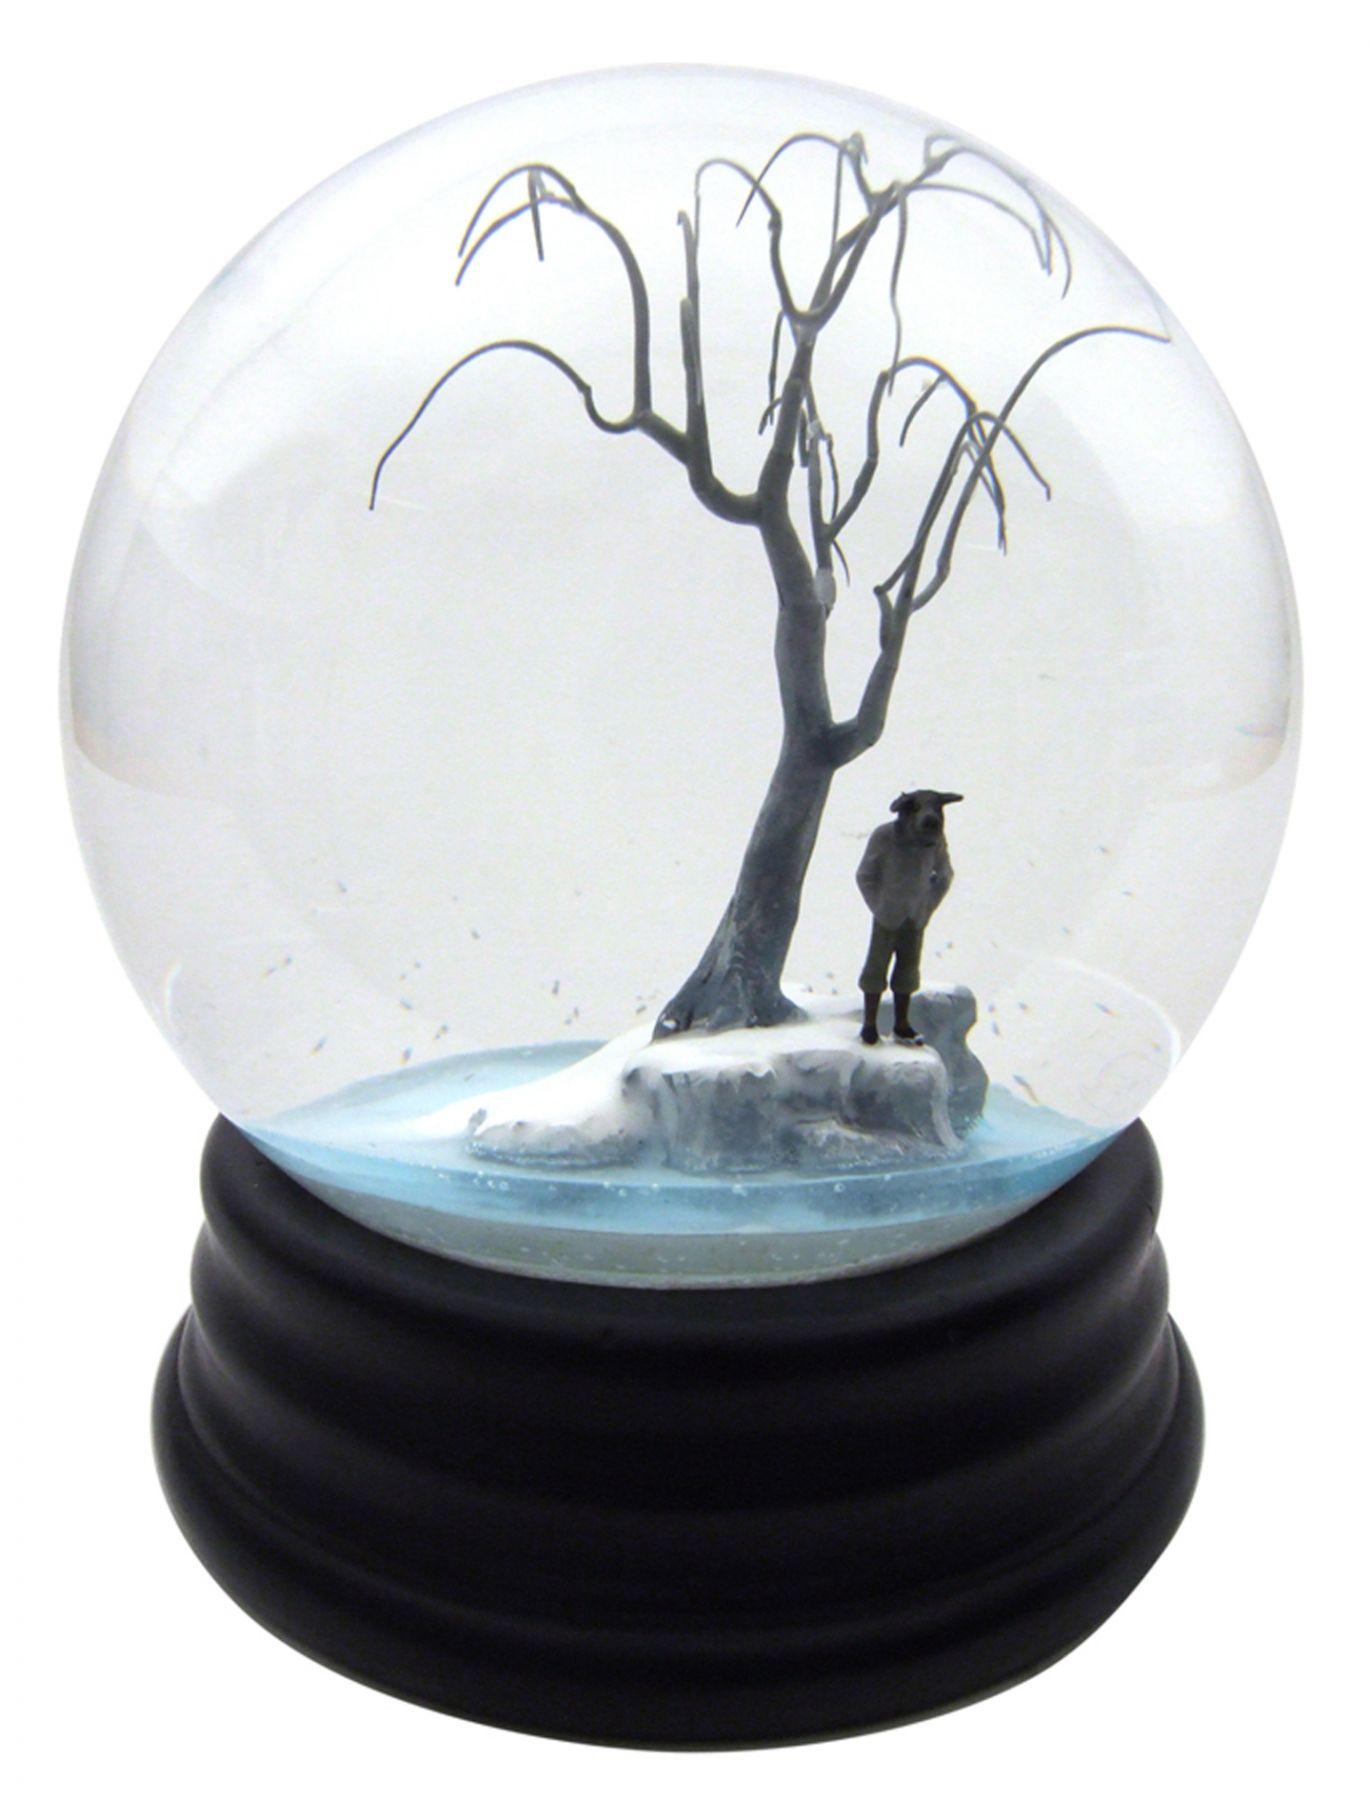 Walter Martin & Paloma Munoz, Traveler CCXXXI (231), 2012, glass, wood, water and plastic, 9 x 6 x 6 inches